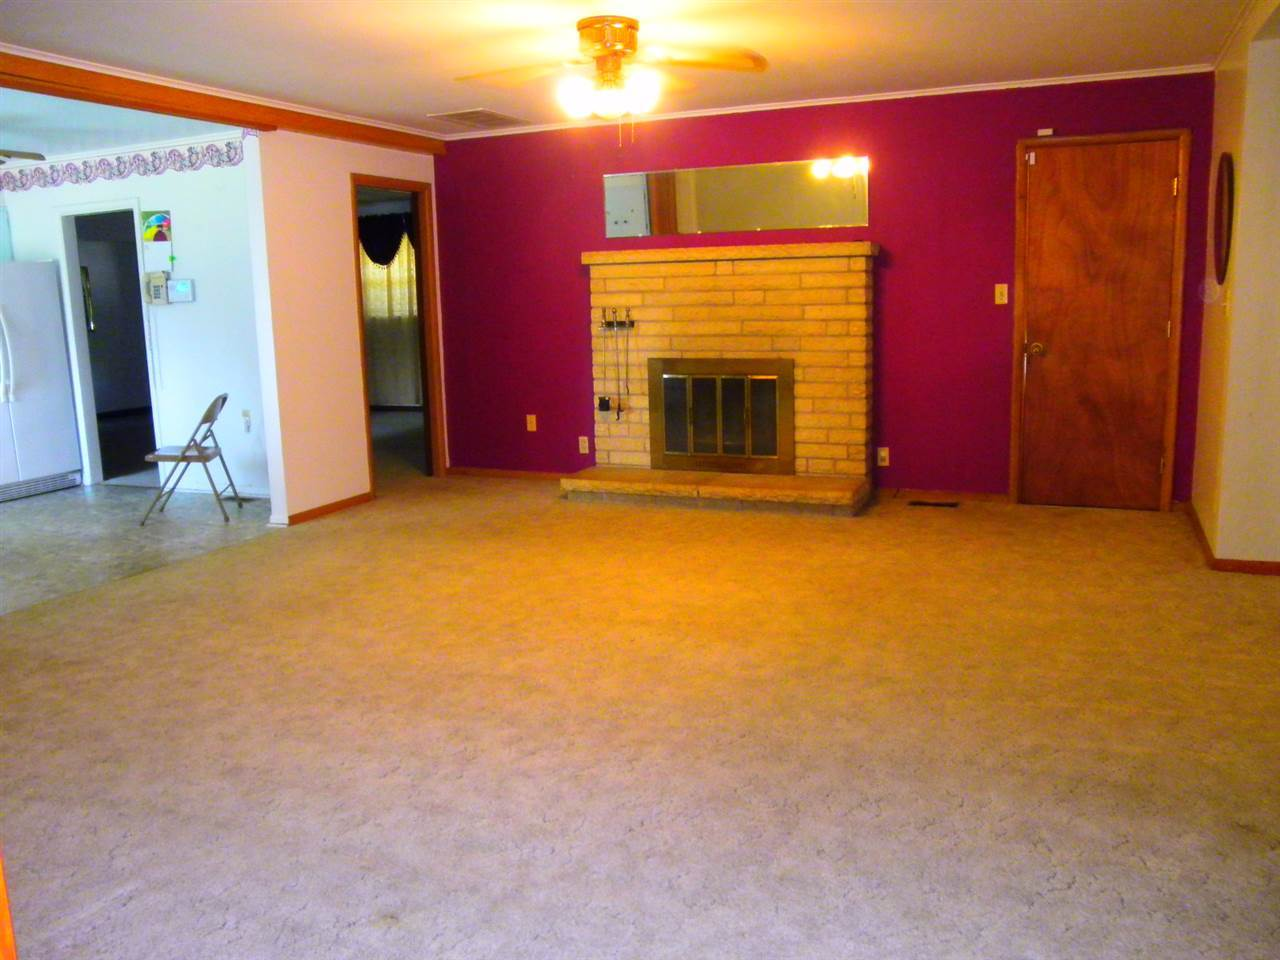 Sold Cross Sale W/ MLS | 1601 Blackard Ponca City, OK 74604 1